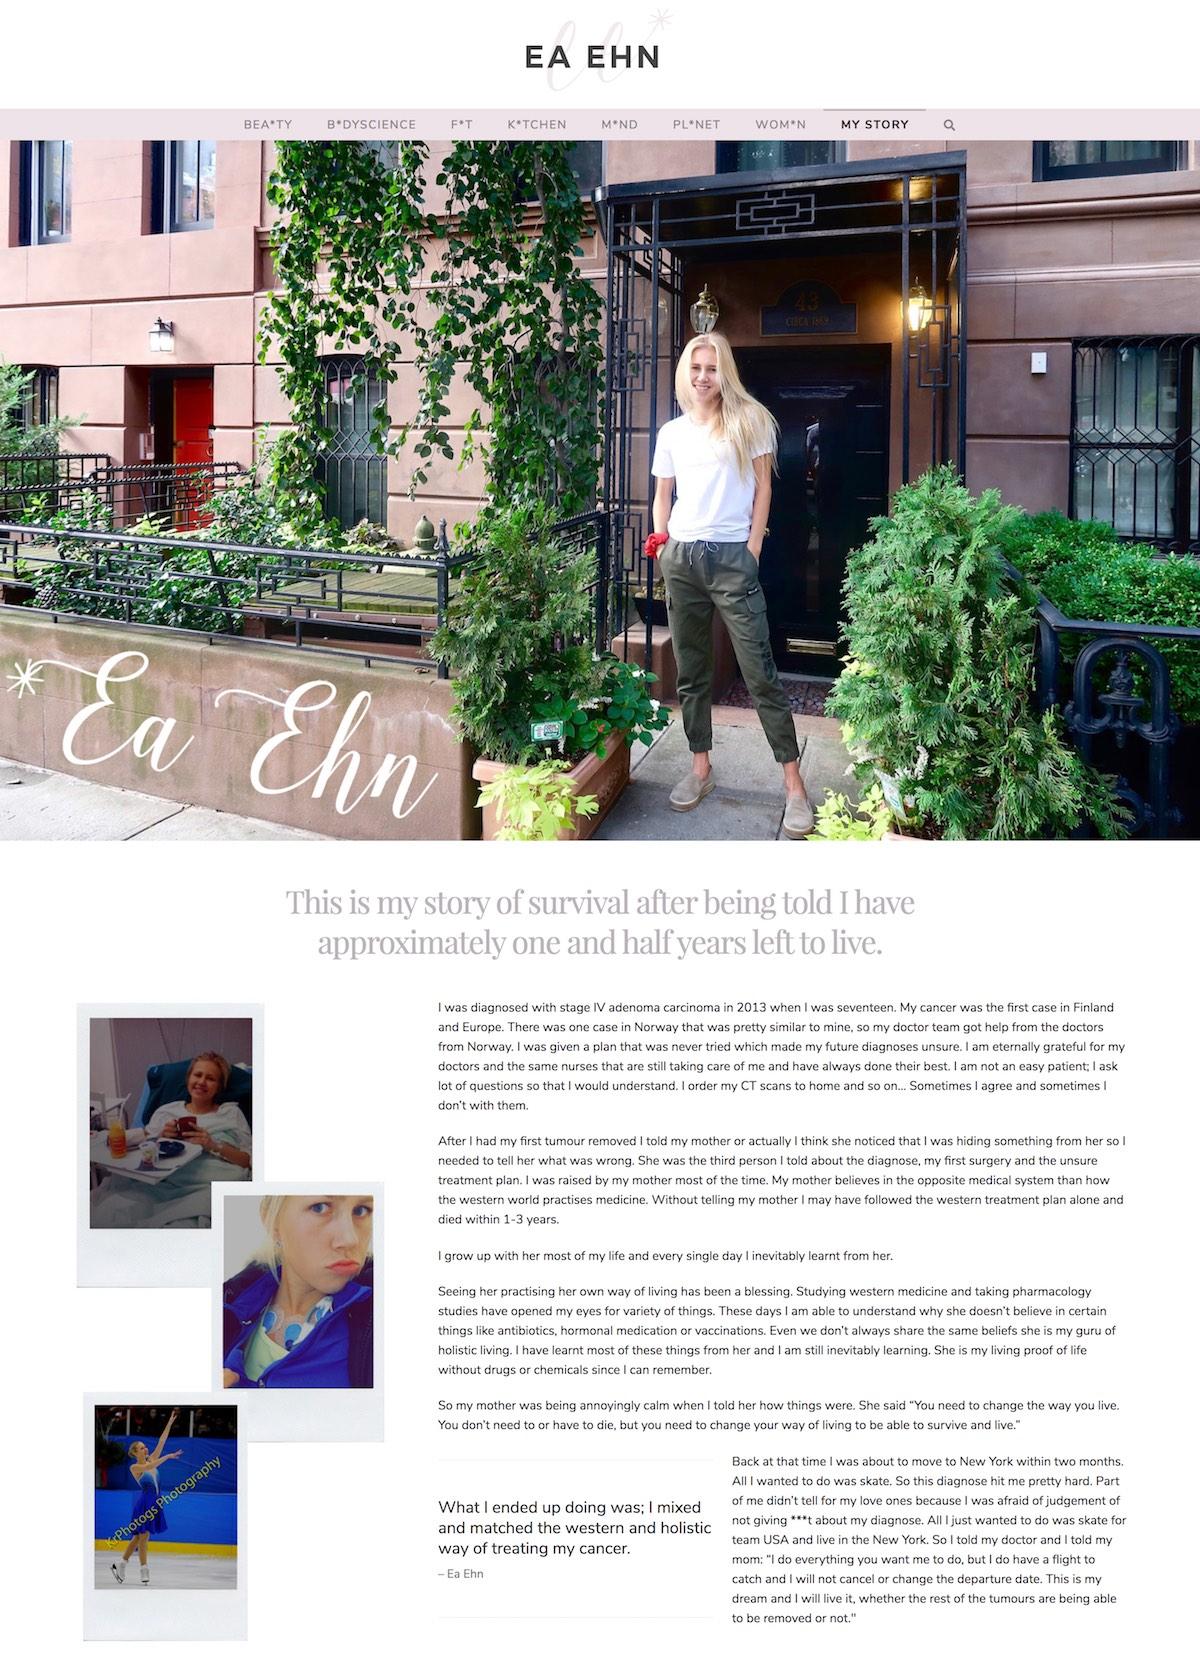 eaehn-web-design-for-influencers-in-wellness